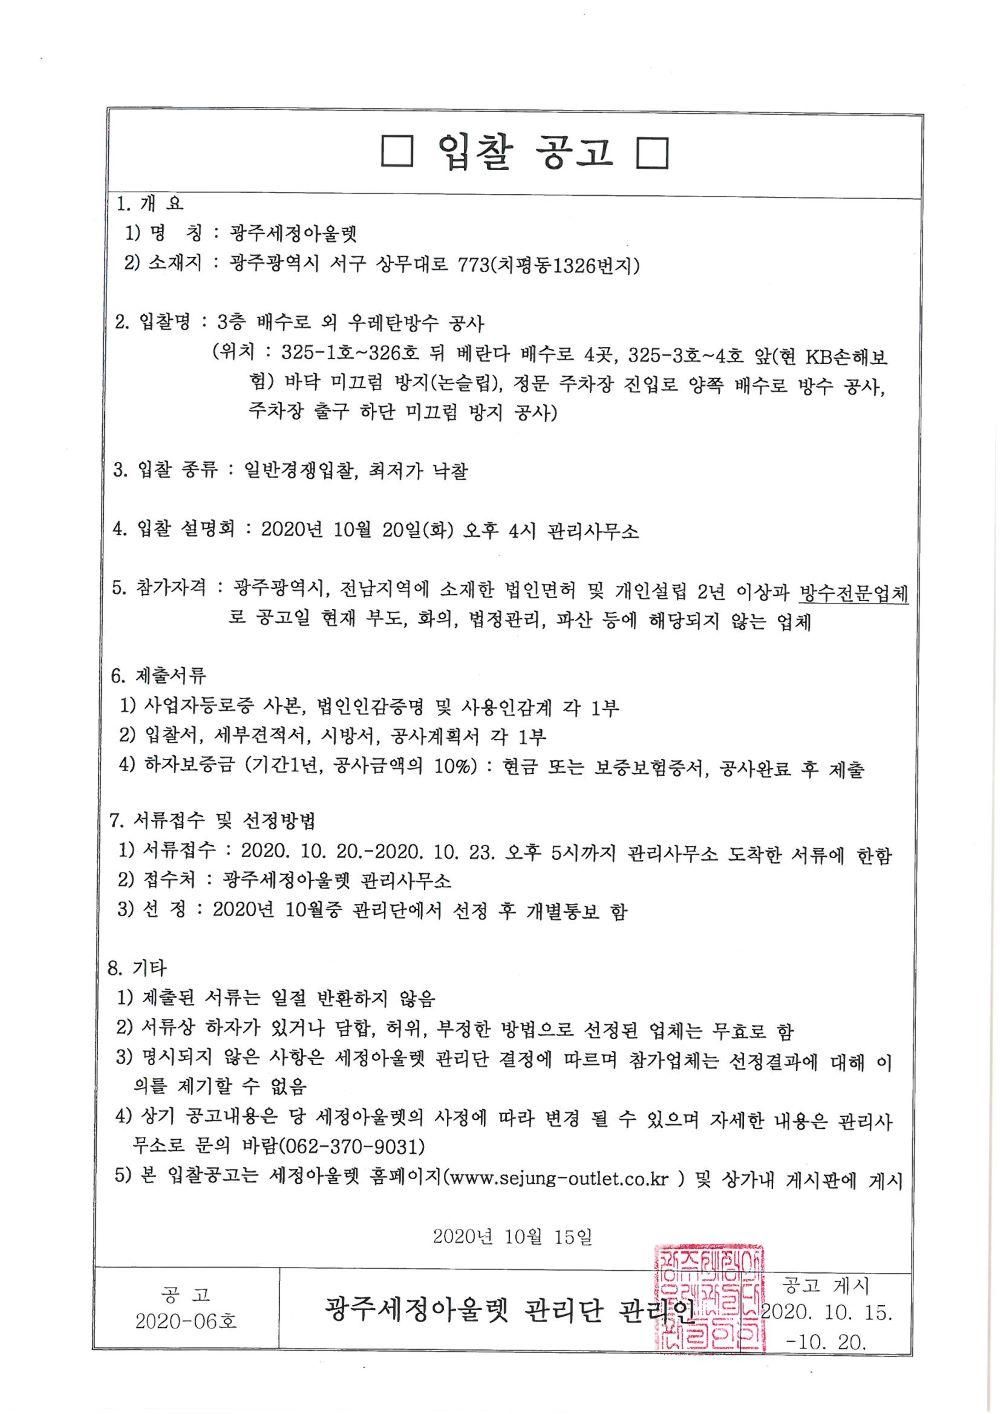 http://www.sejung-outlet.co.kr/bs/se2/imgup/1602729127입찰공고(3층_배수로외_방수공사).hwp.jpg